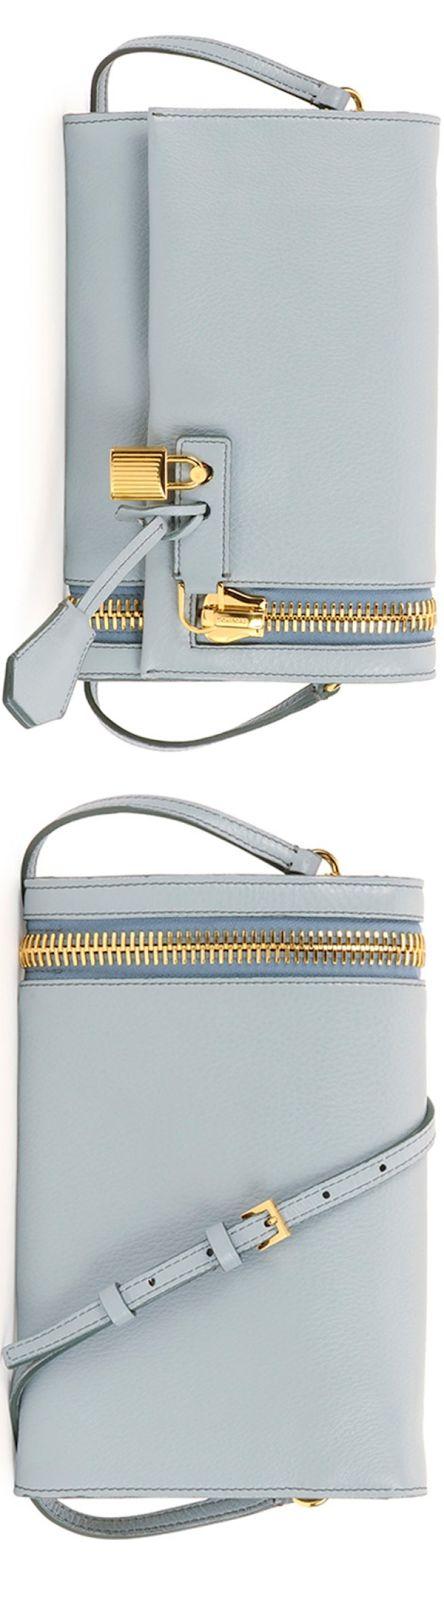 Tom Ford Alix Small Zip & Padlock Crossbody Bag, Light Blue LOOKandLOVEwithLOLO